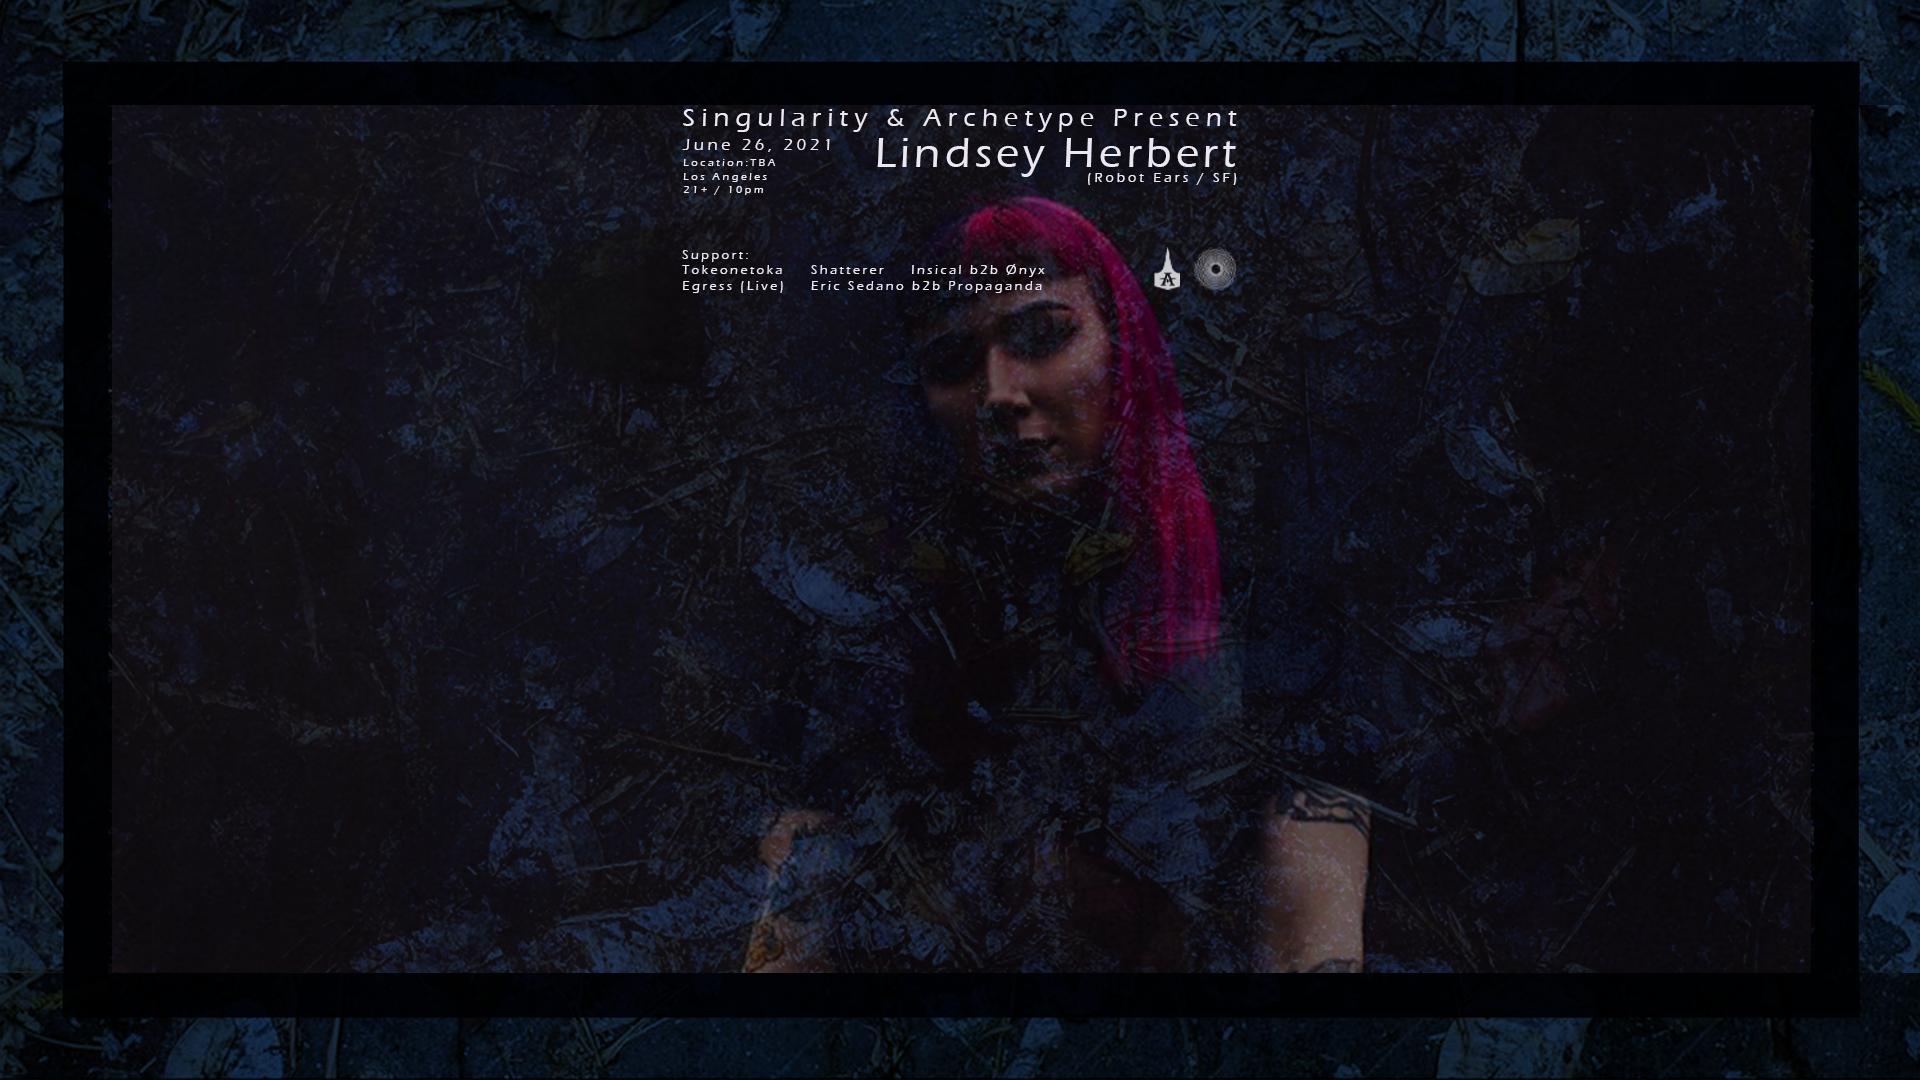 Archetype x Singularity Present: Lindsey Herbert